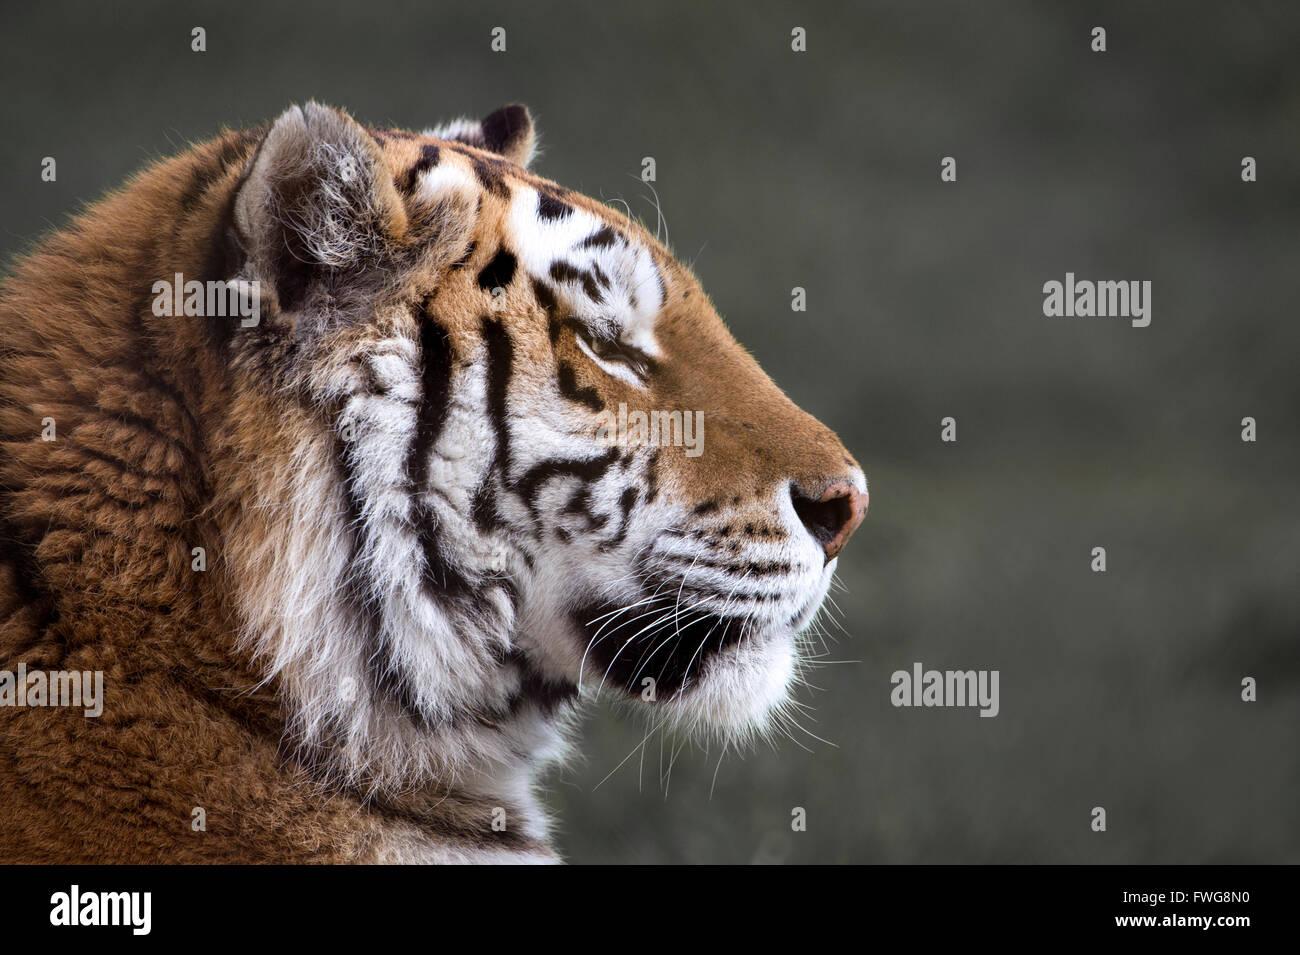 Female Amur (Siberian) tiger (profile) - Stock Image